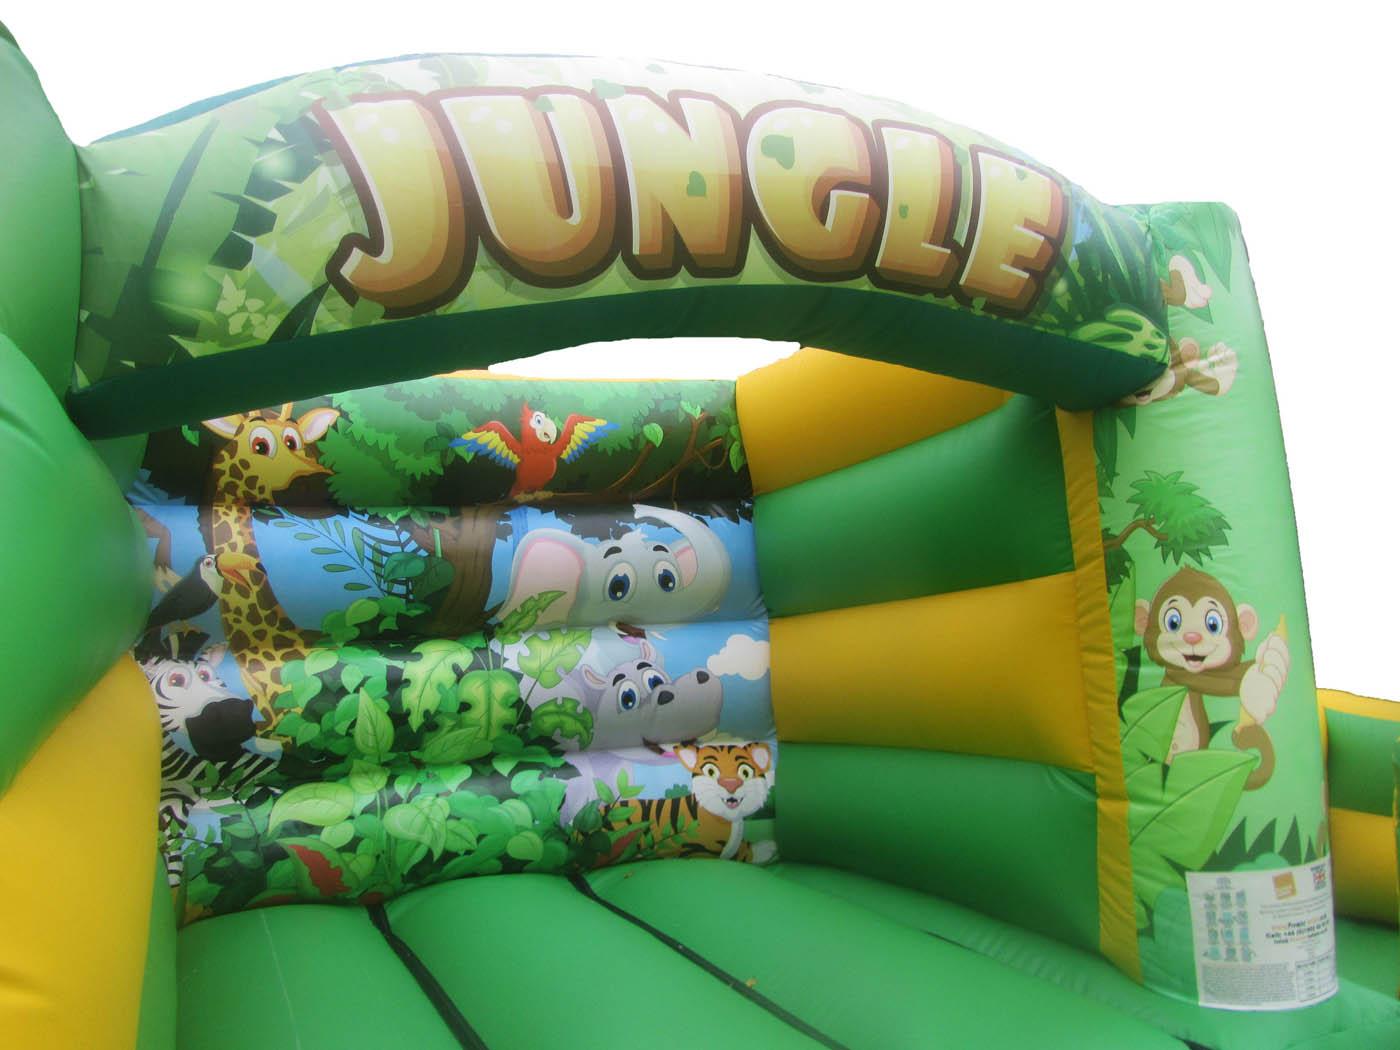 Inflatable digitally printed Jungle Artwork